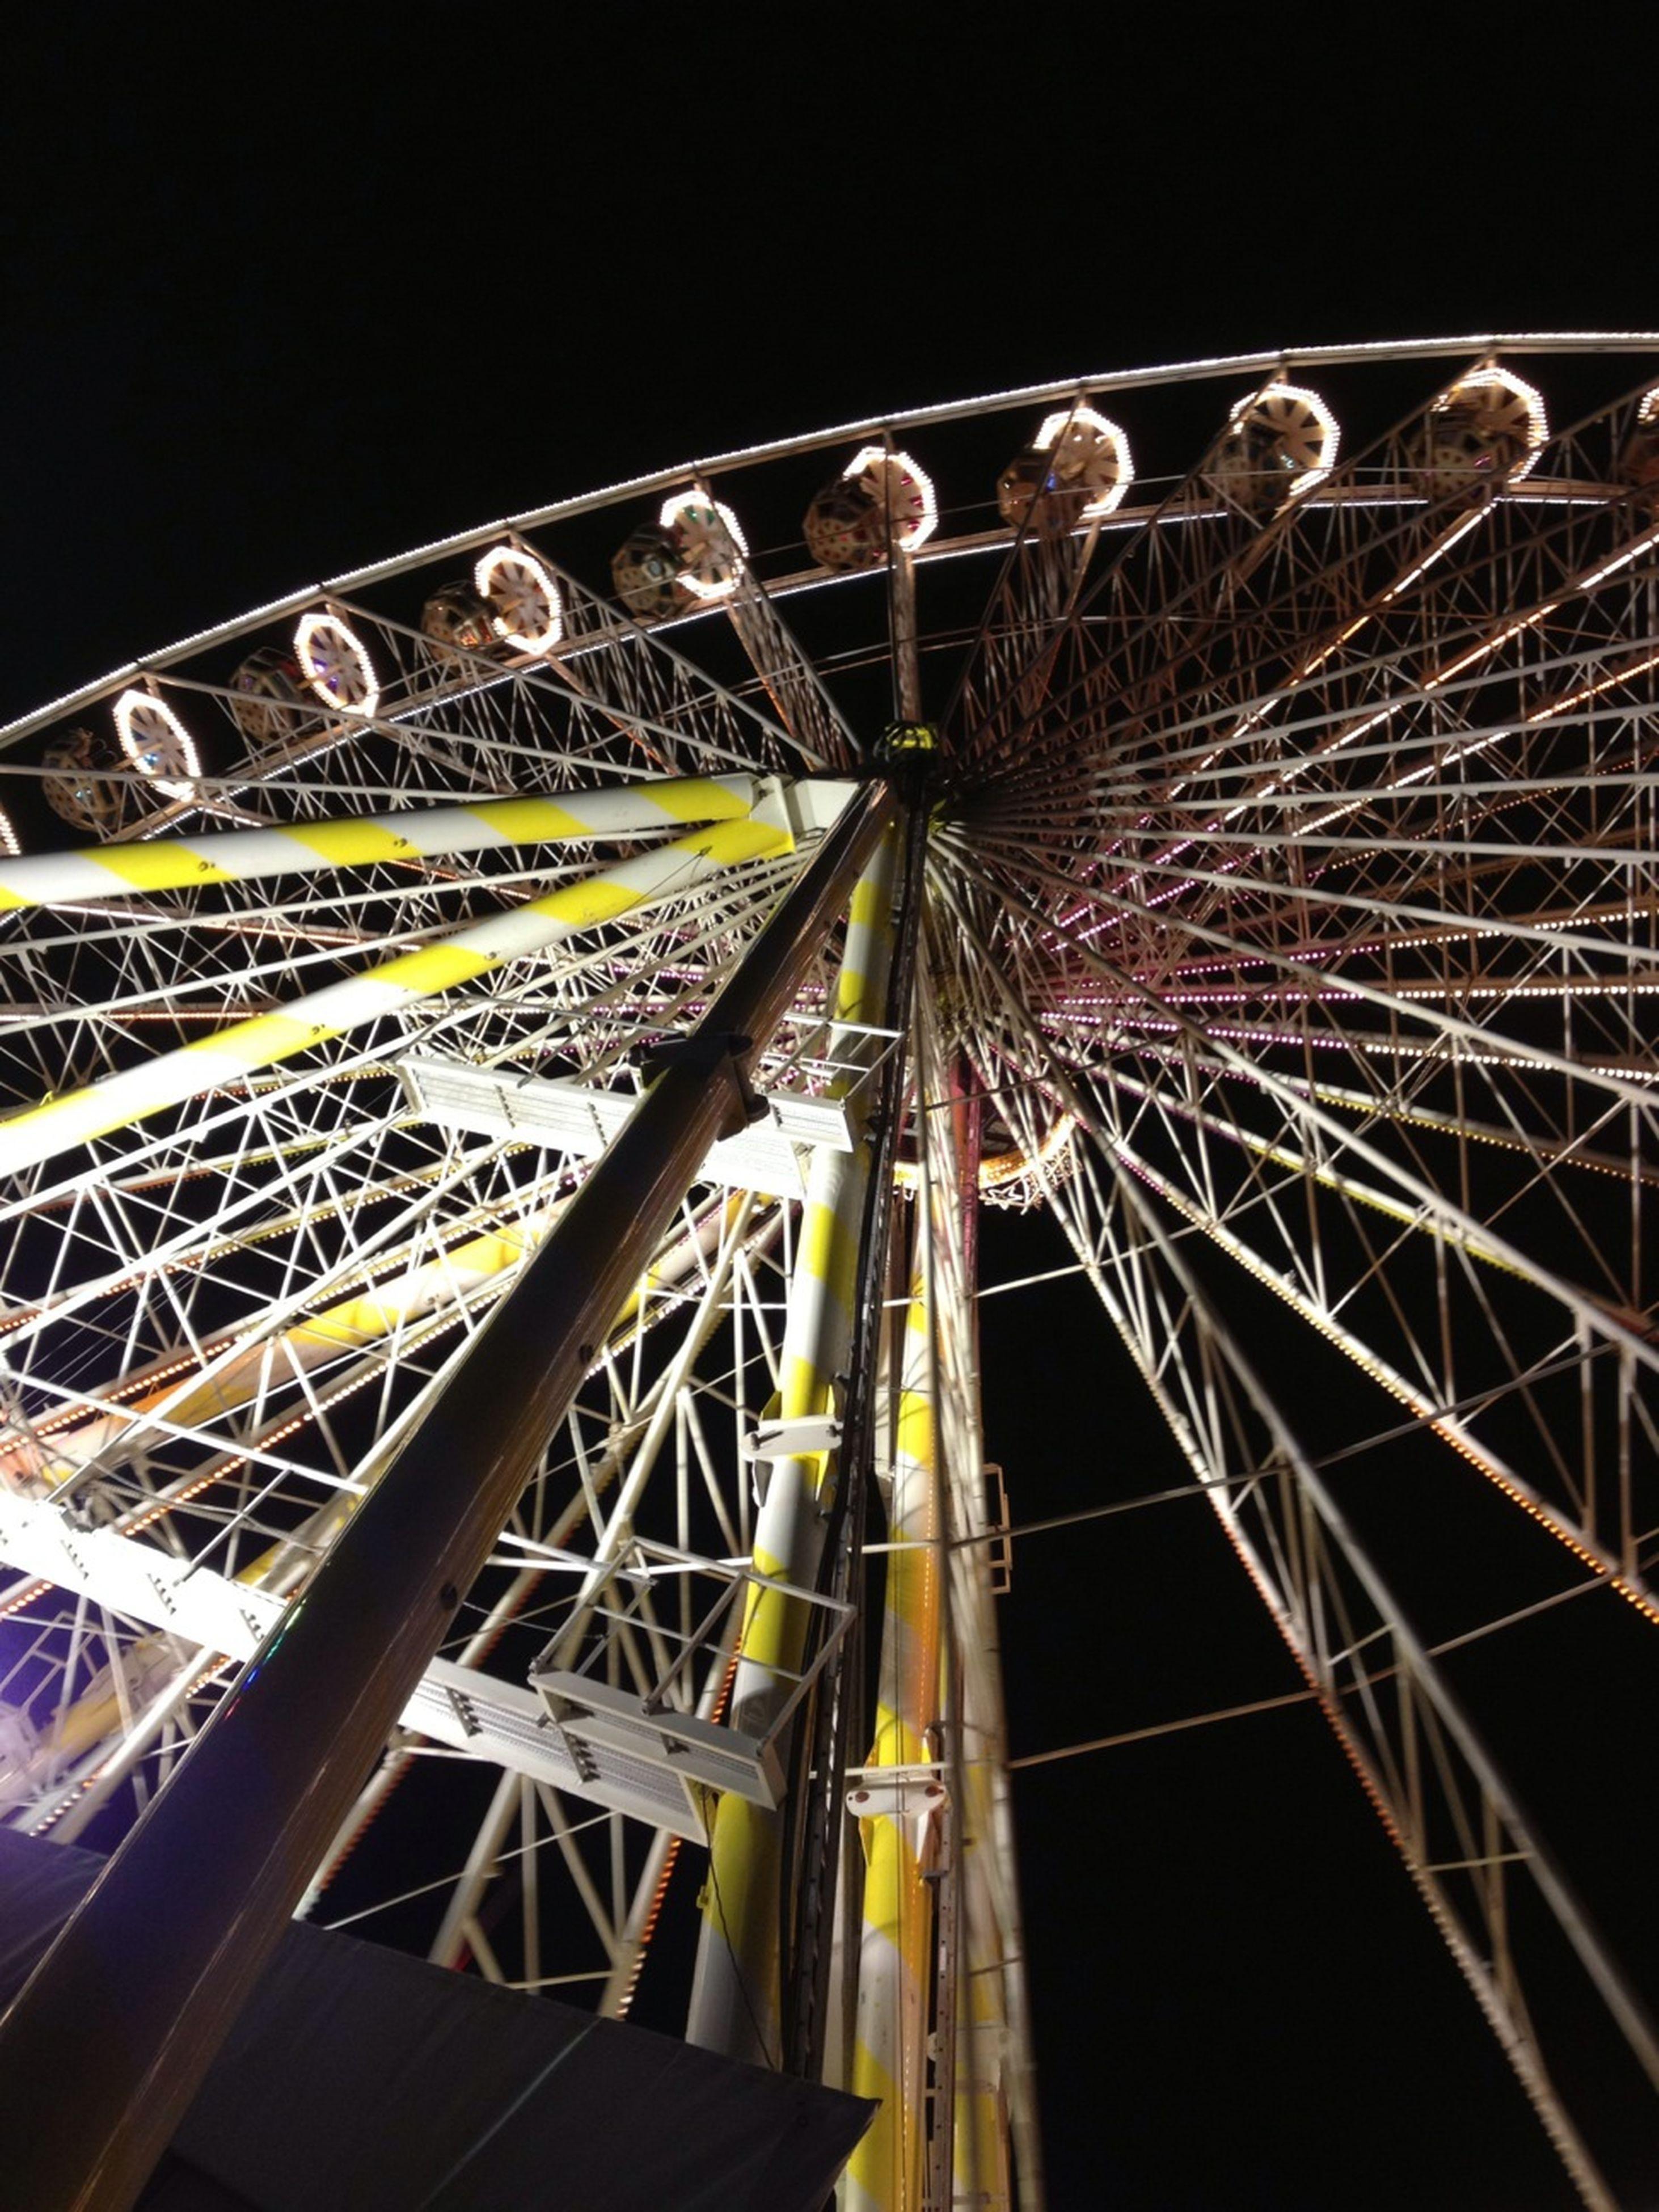 arts culture and entertainment, amusement park, amusement park ride, ferris wheel, night, low angle view, illuminated, built structure, clear sky, architecture, sky, motion, fun, long exposure, outdoors, leisure activity, large, enjoyment, traveling carnival, fairground ride